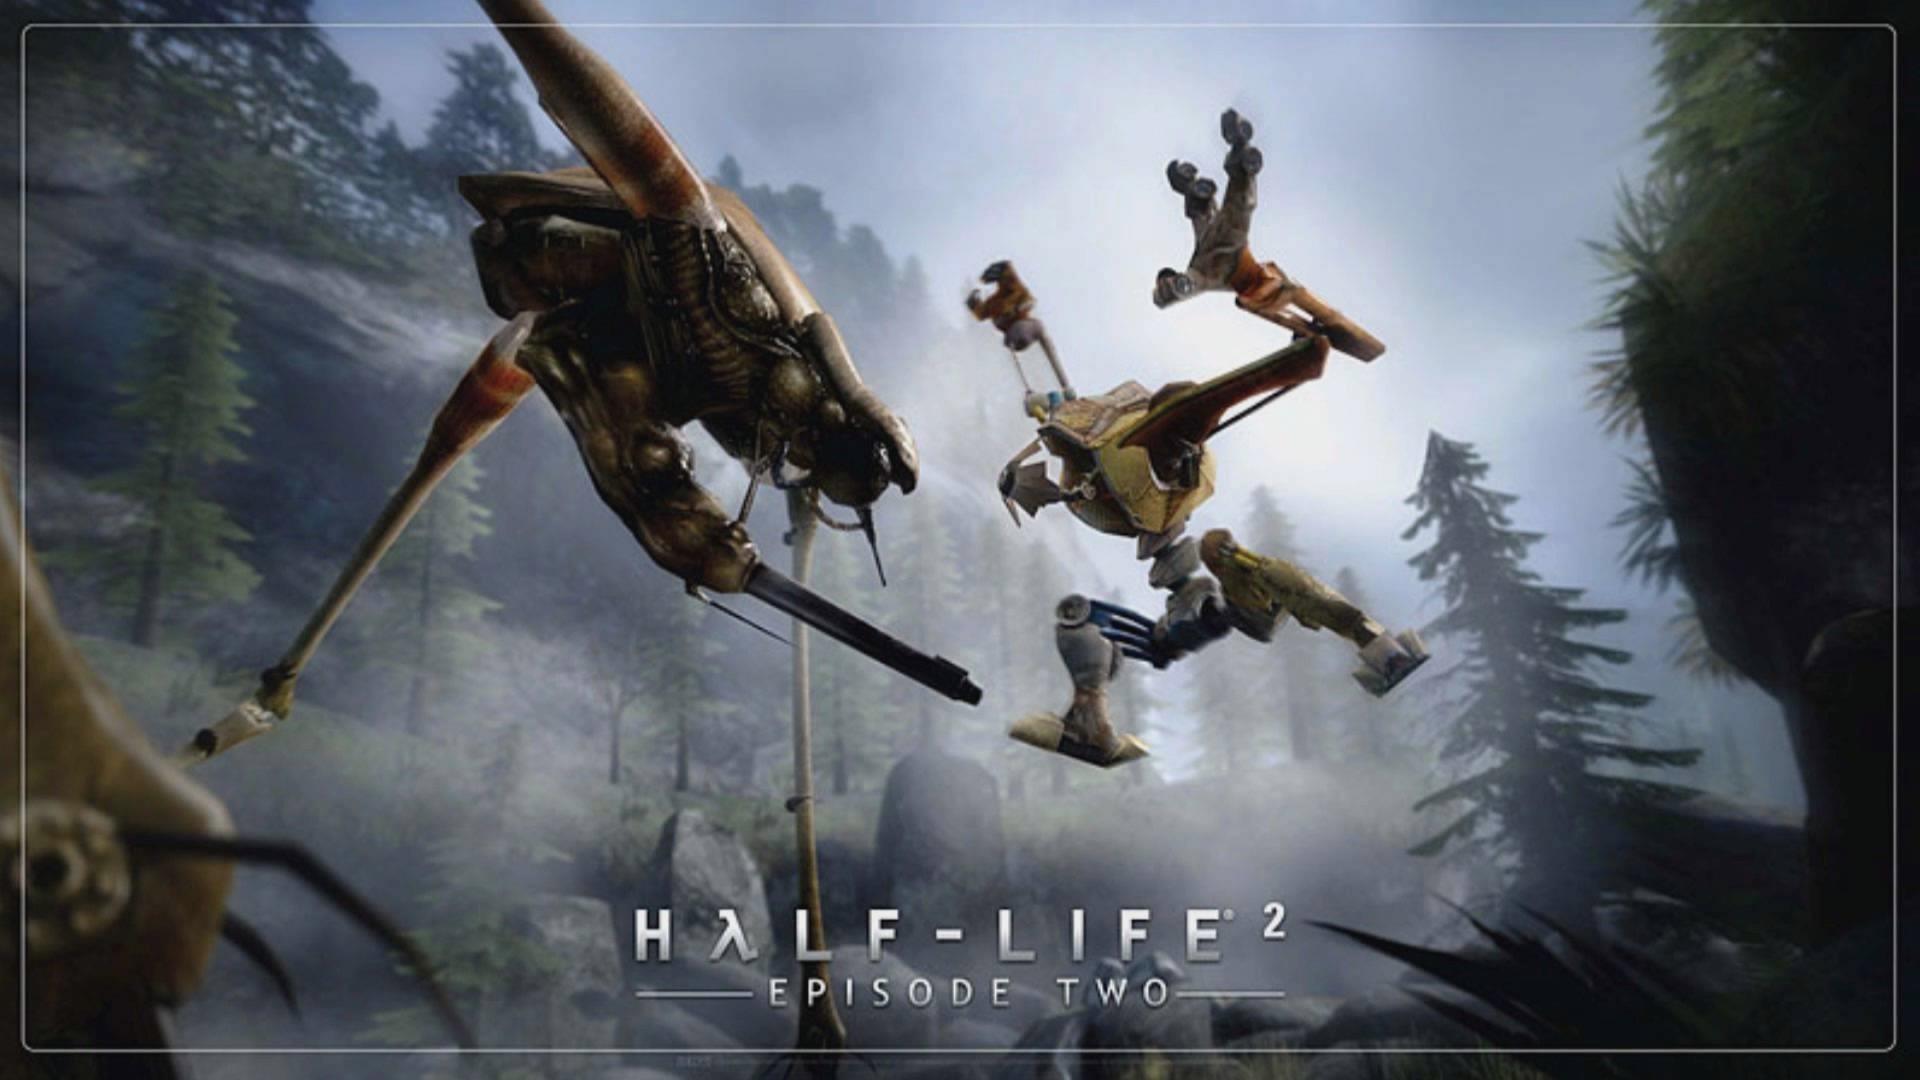 Half Life 2 Wallpaper Download Free Beautiful Full Hd